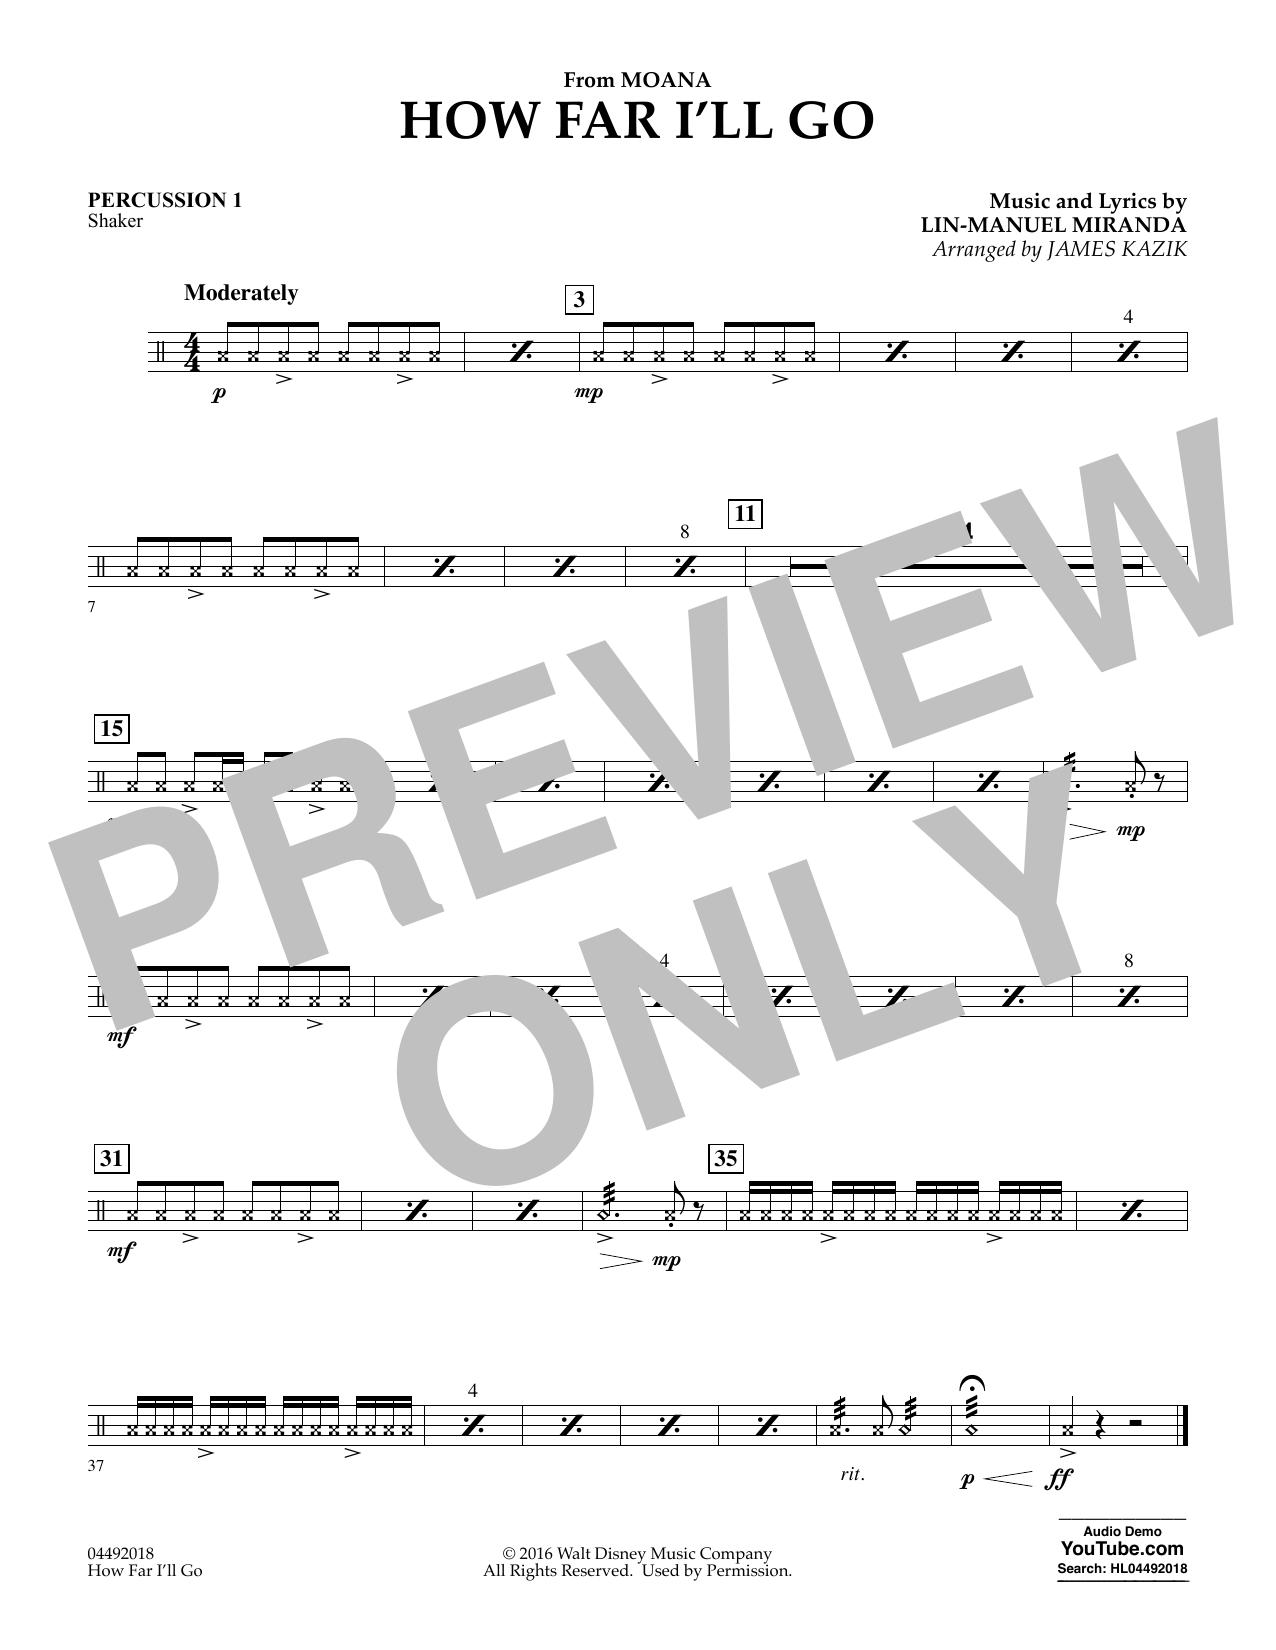 Sheet Music Digital Files To Print - Licensed James Kazik Digital ...